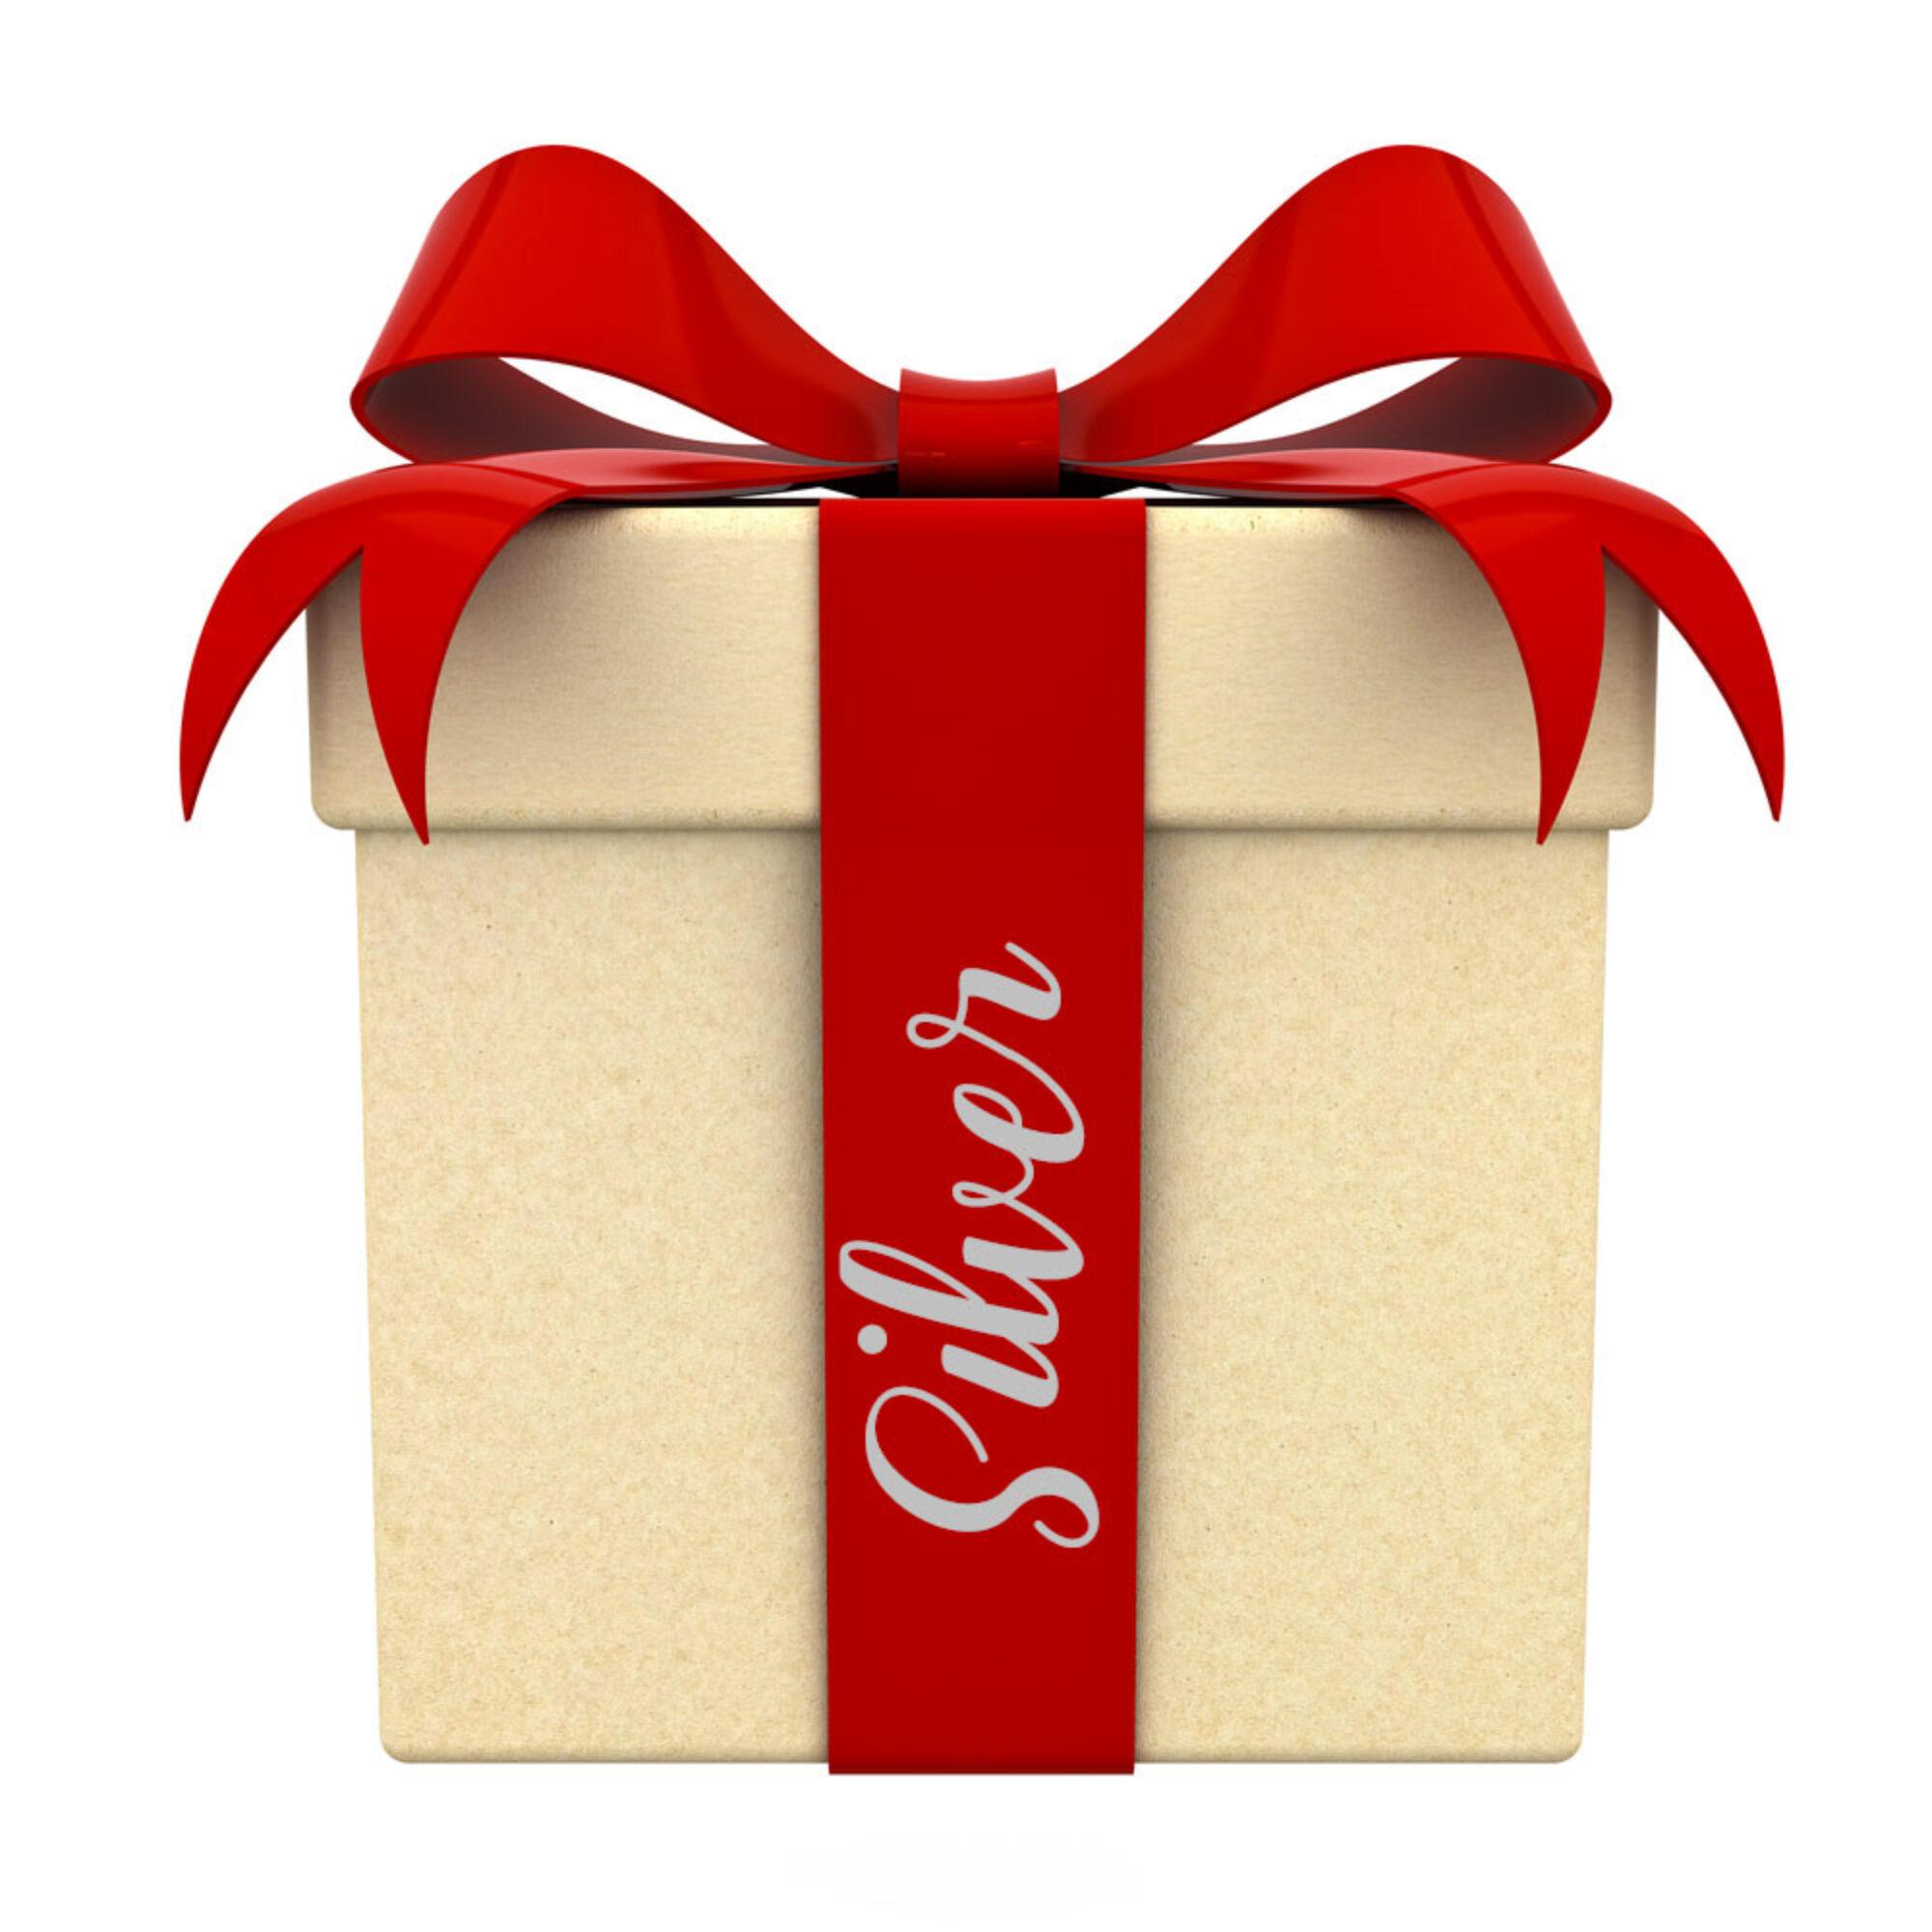 CHRISTMAS BOX SILVER